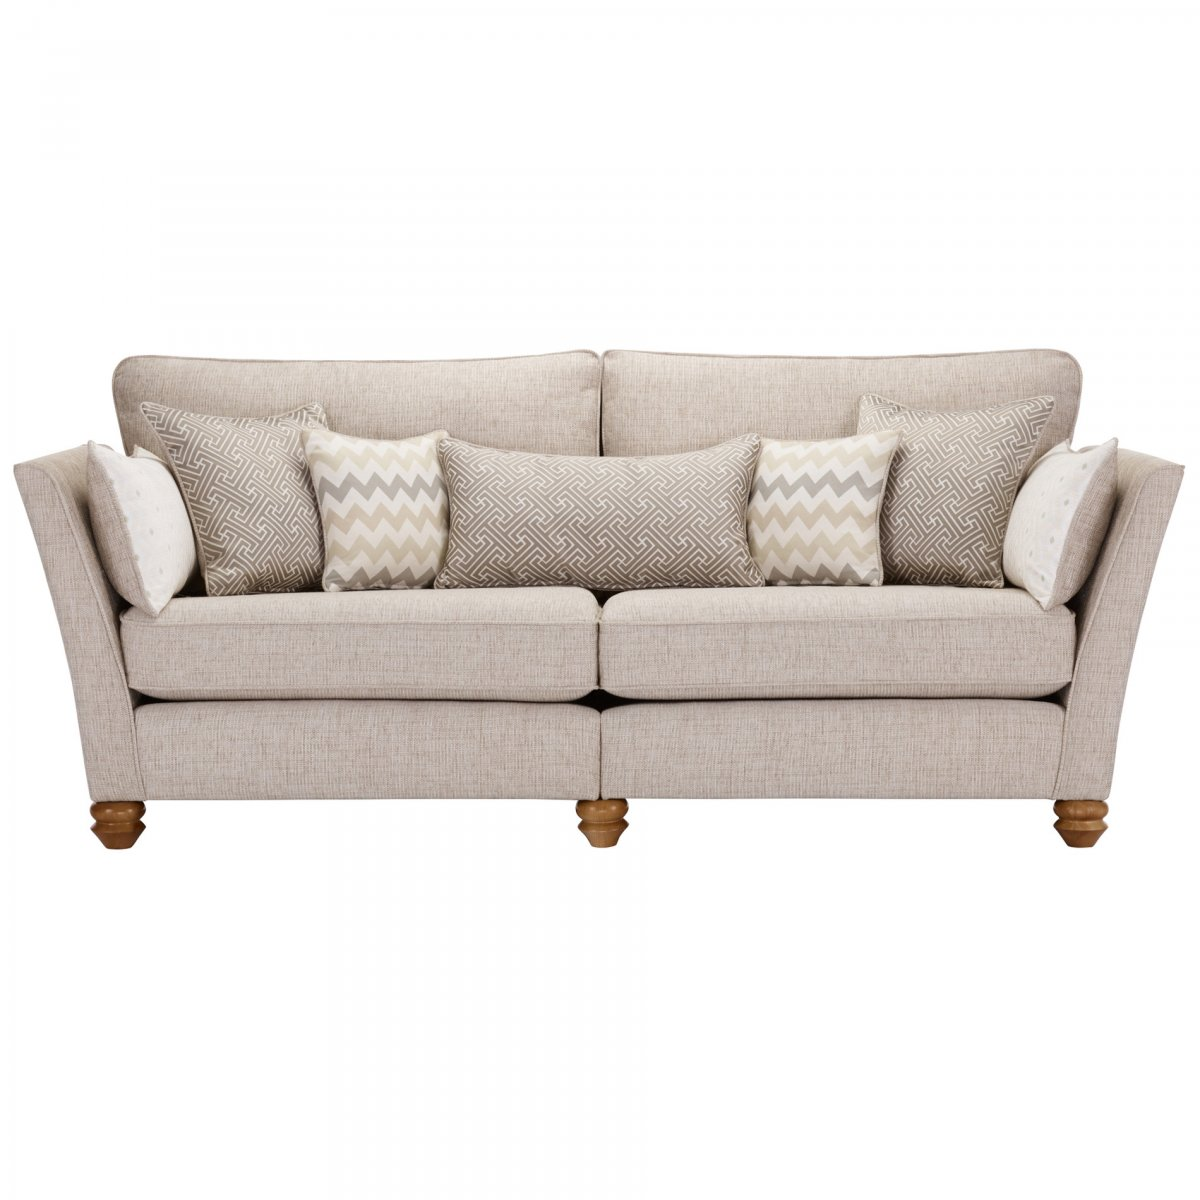 sofa grau holzfe great sofa preis volles sofabett schlafcouch zu verkaufen bequemstes. Black Bedroom Furniture Sets. Home Design Ideas